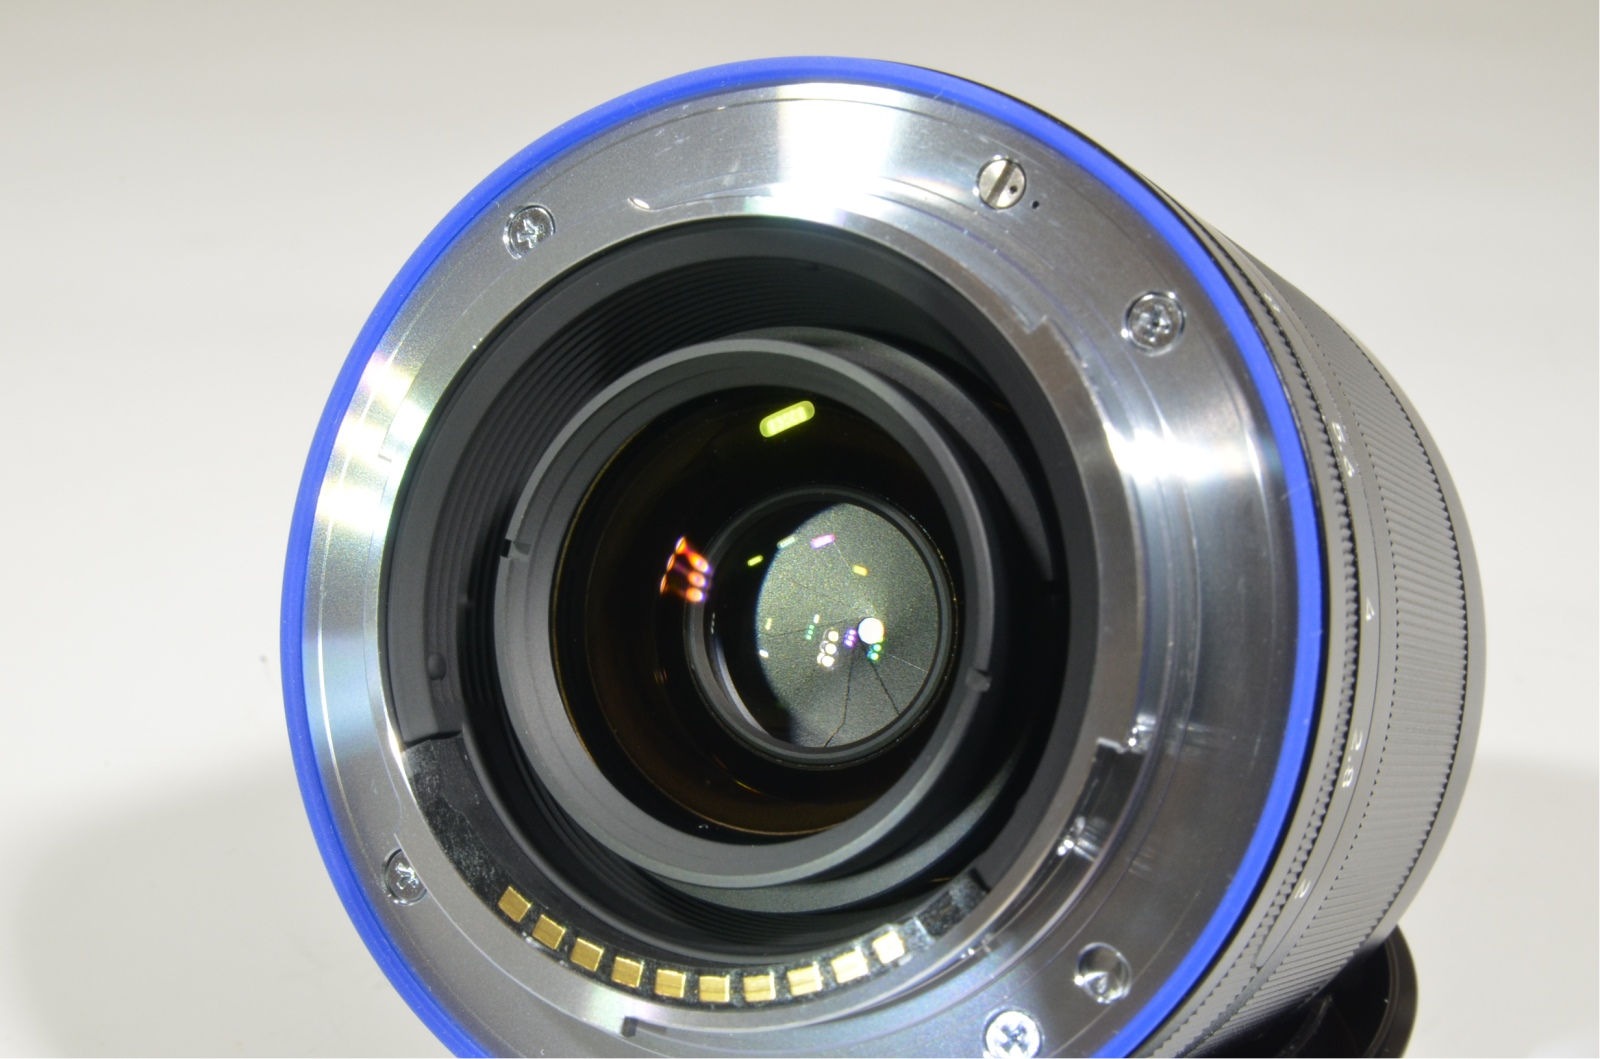 carl zeiss loxia 35mm f/2 biogon t* lens for sony e mount